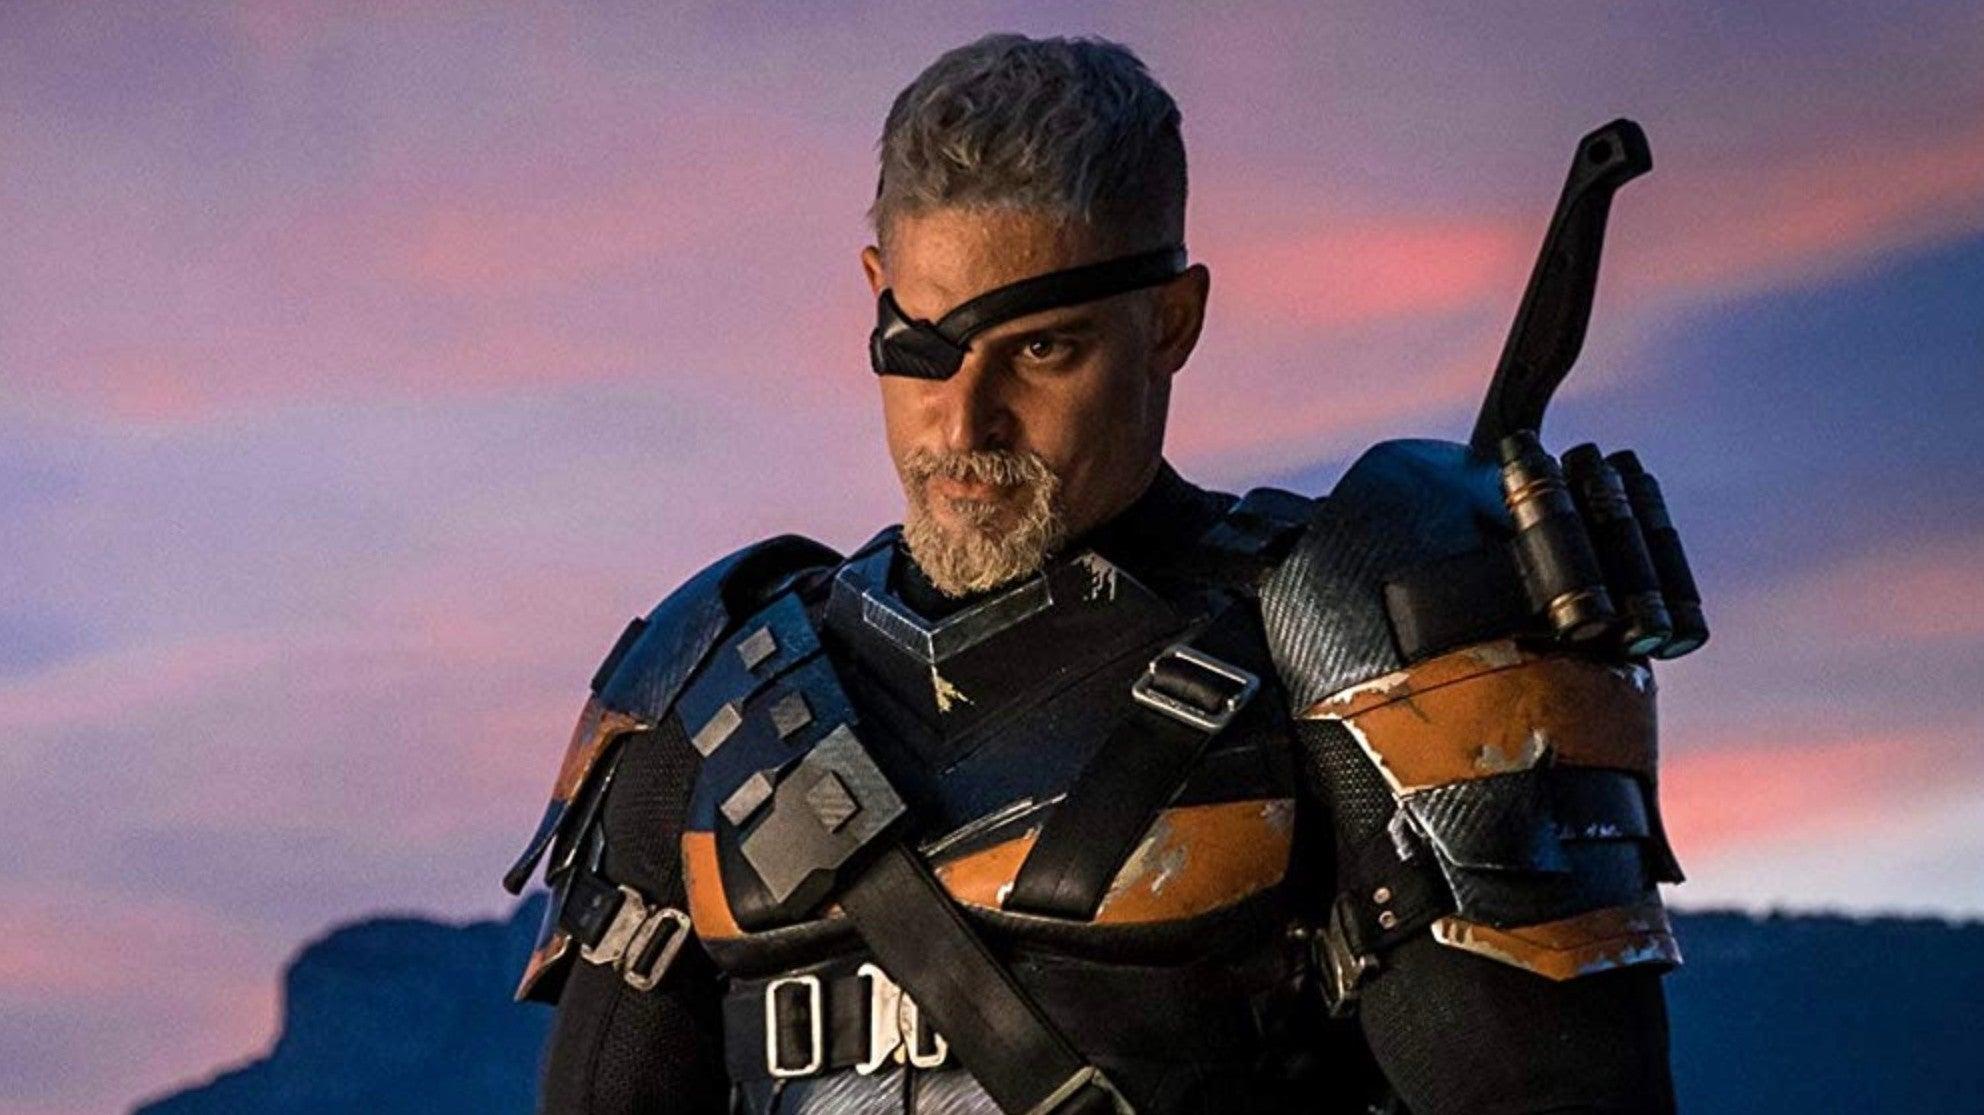 Joe Manganiello To Star In Elijah Wood Produced Superhero Film